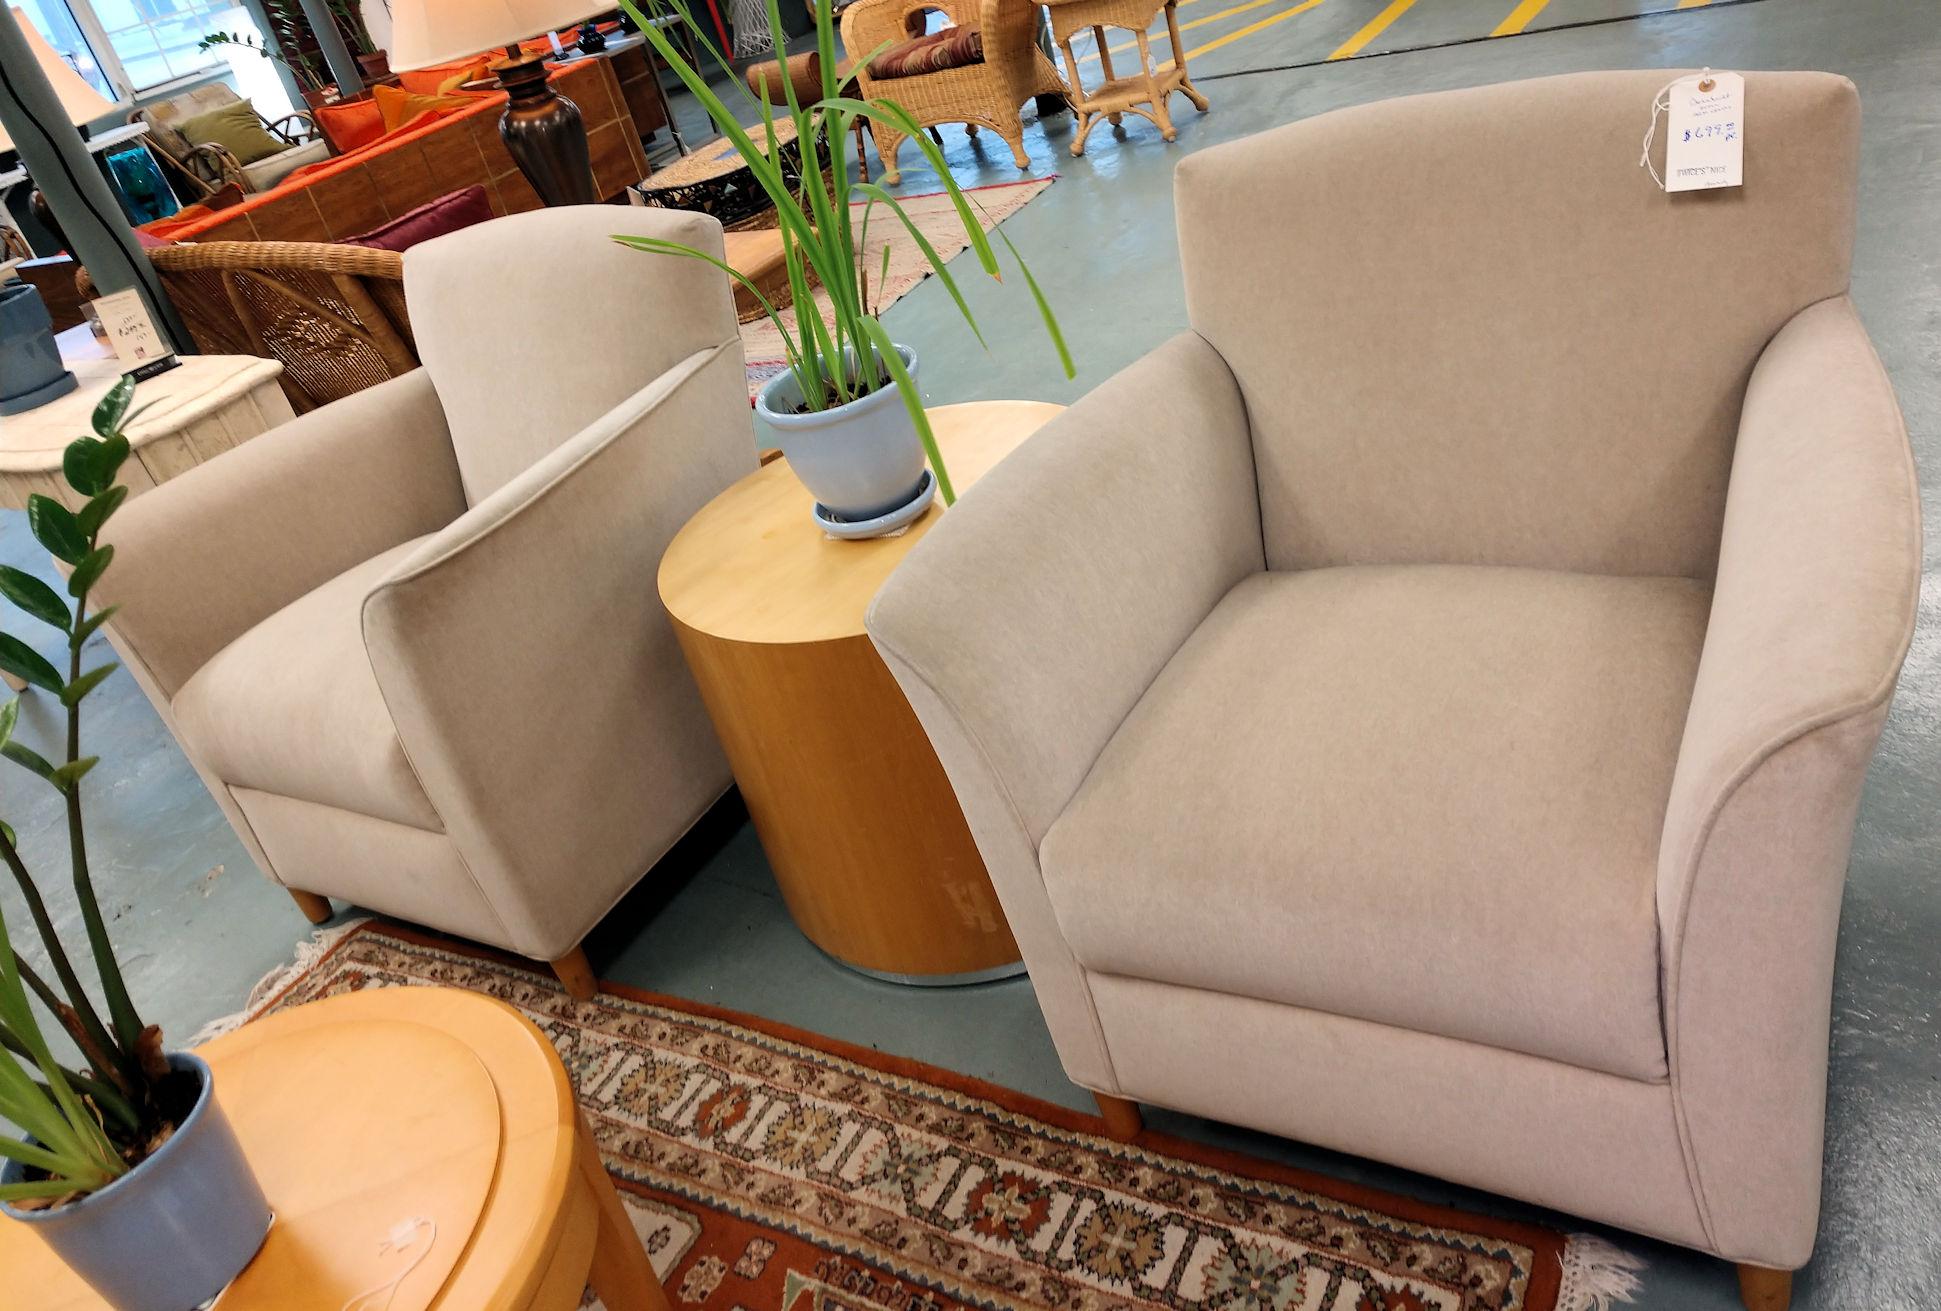 LR0285-Bernhardt-ultrasuede-armchairs-pr.